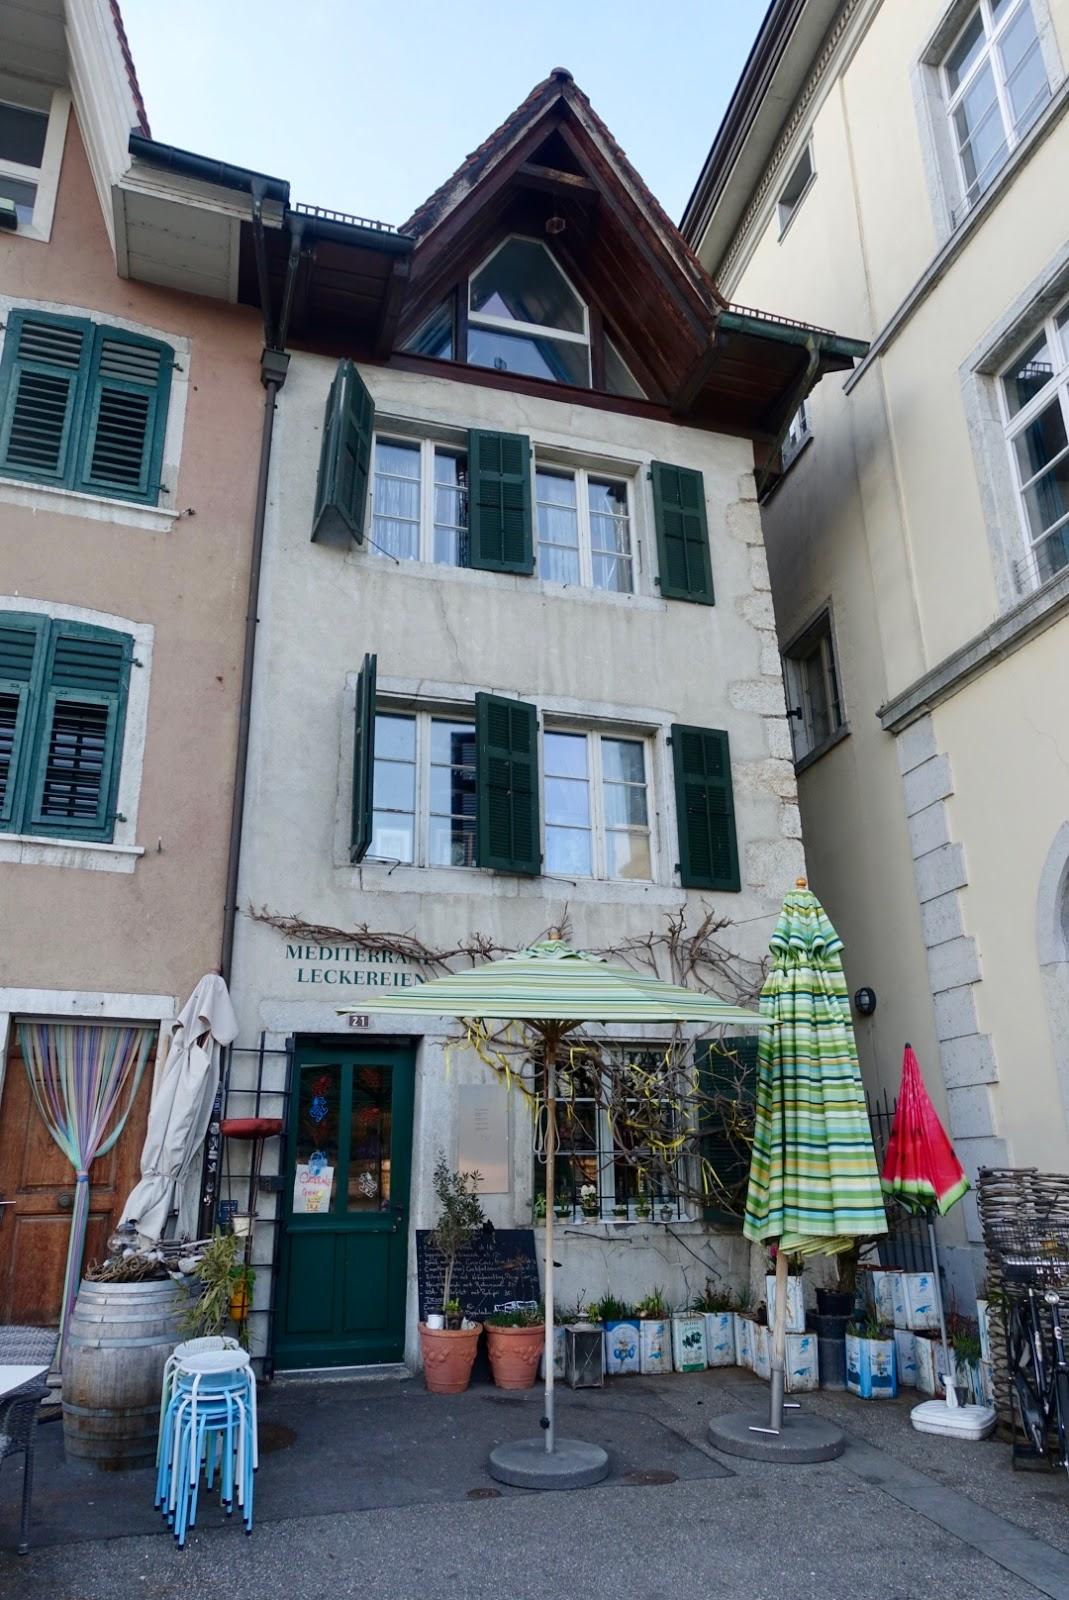 Swiss Traveler: Review of Restaurant Mediterrane Leckereien ...